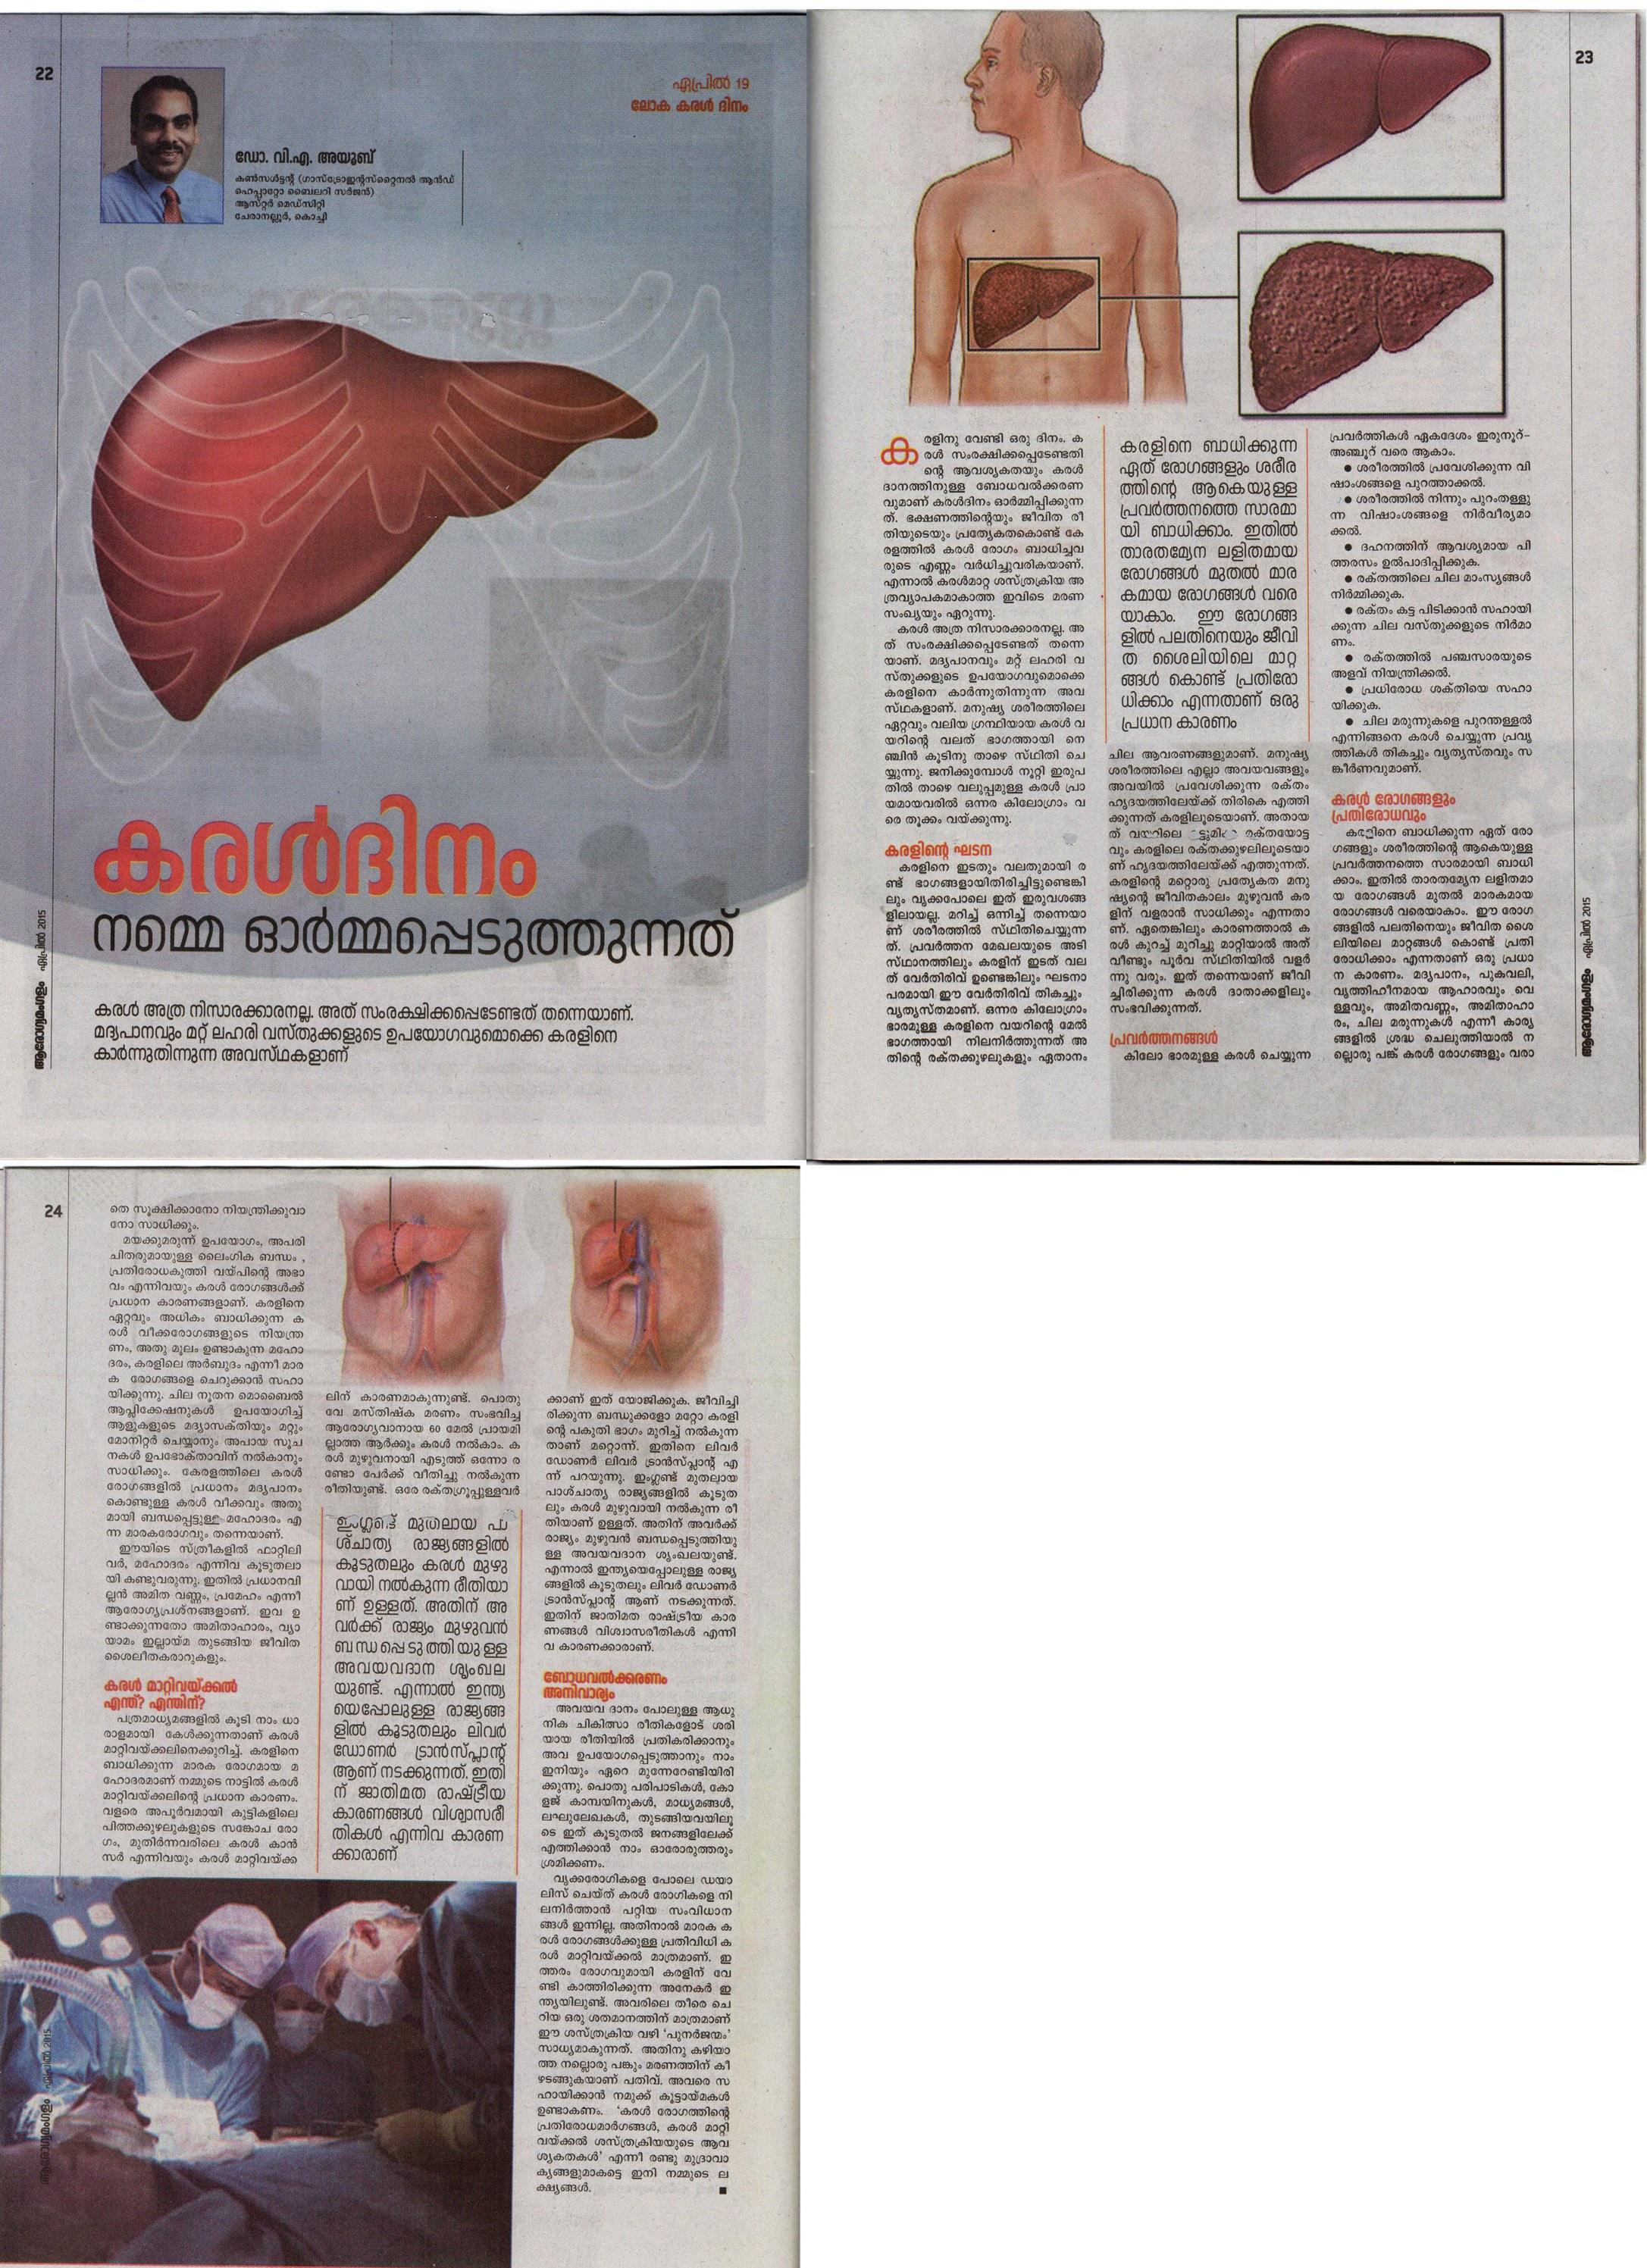 Arogya_Mangalam_-_Dr_Iyoob_-_Liver_Diseases